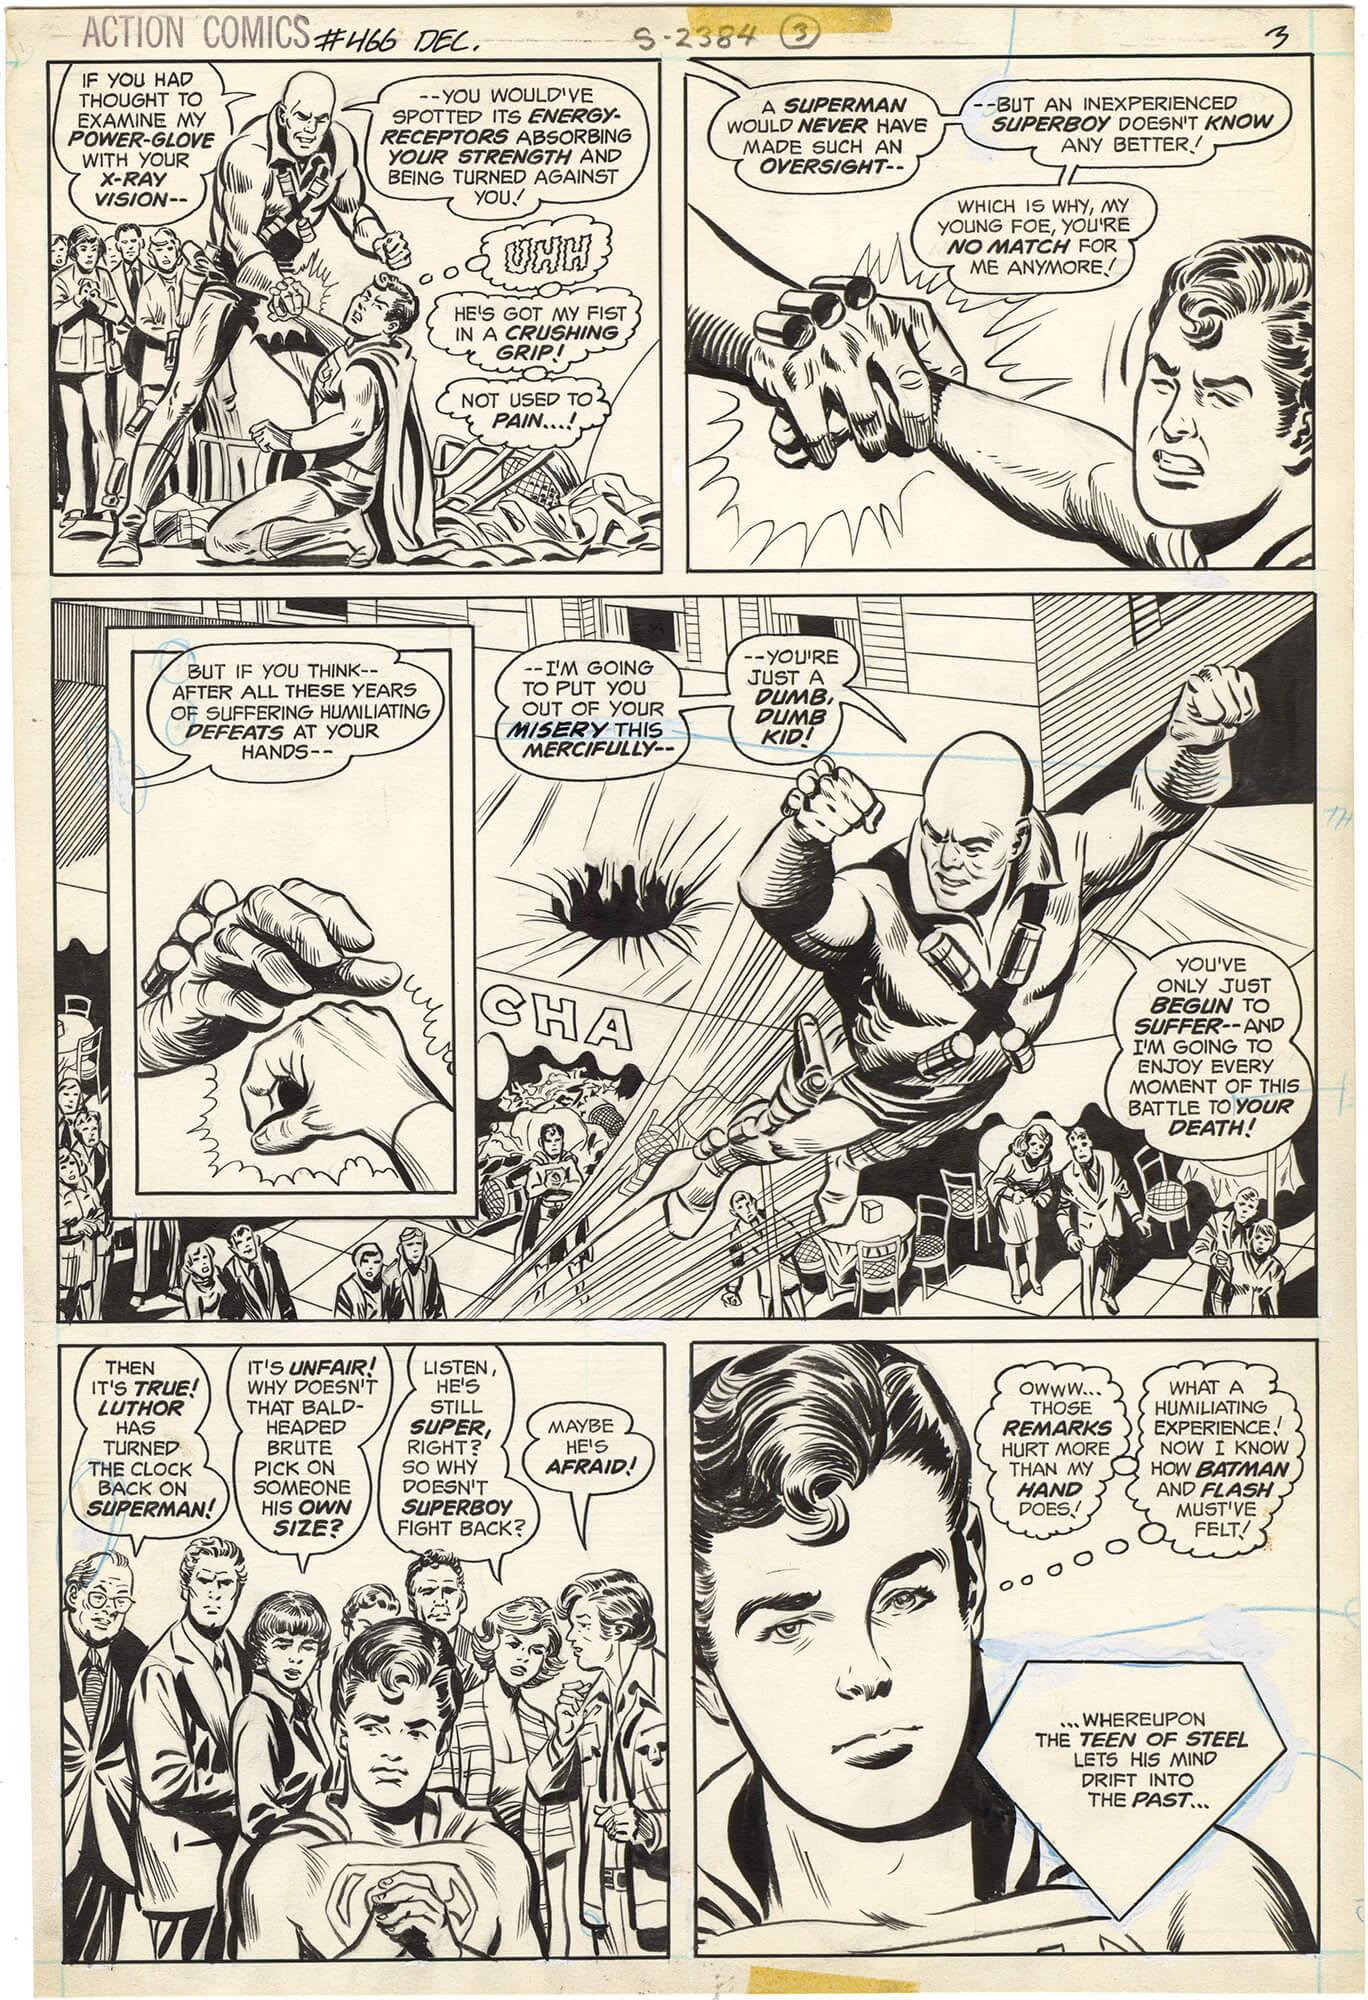 Action Comics #466 p3